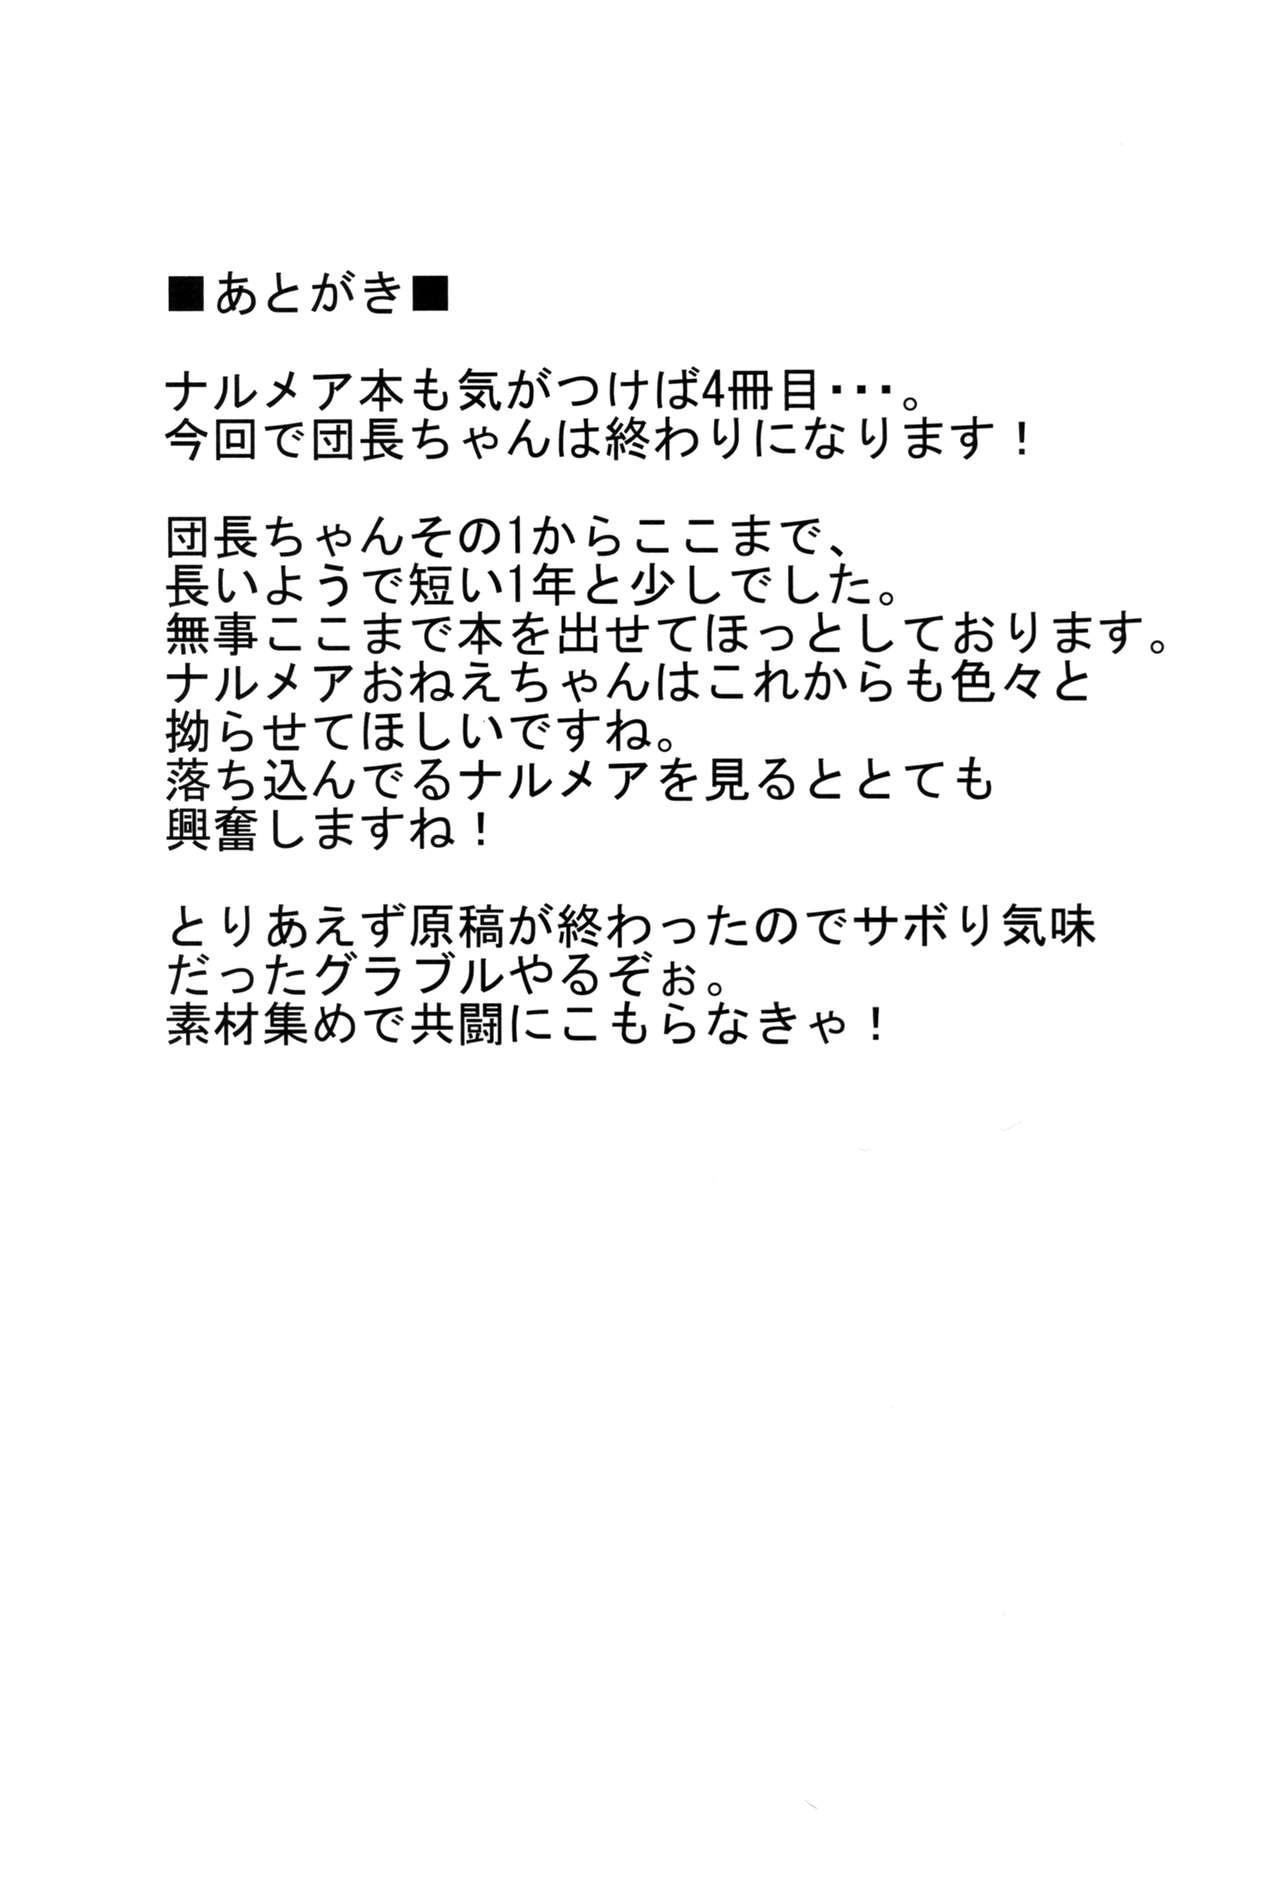 (COMIC1☆11) [Arysuivery (Ayakase Chiyoko, Ayakase Riberi)] Danchou-chan Danchou-chan 4 (Granblue Fantasy) 24